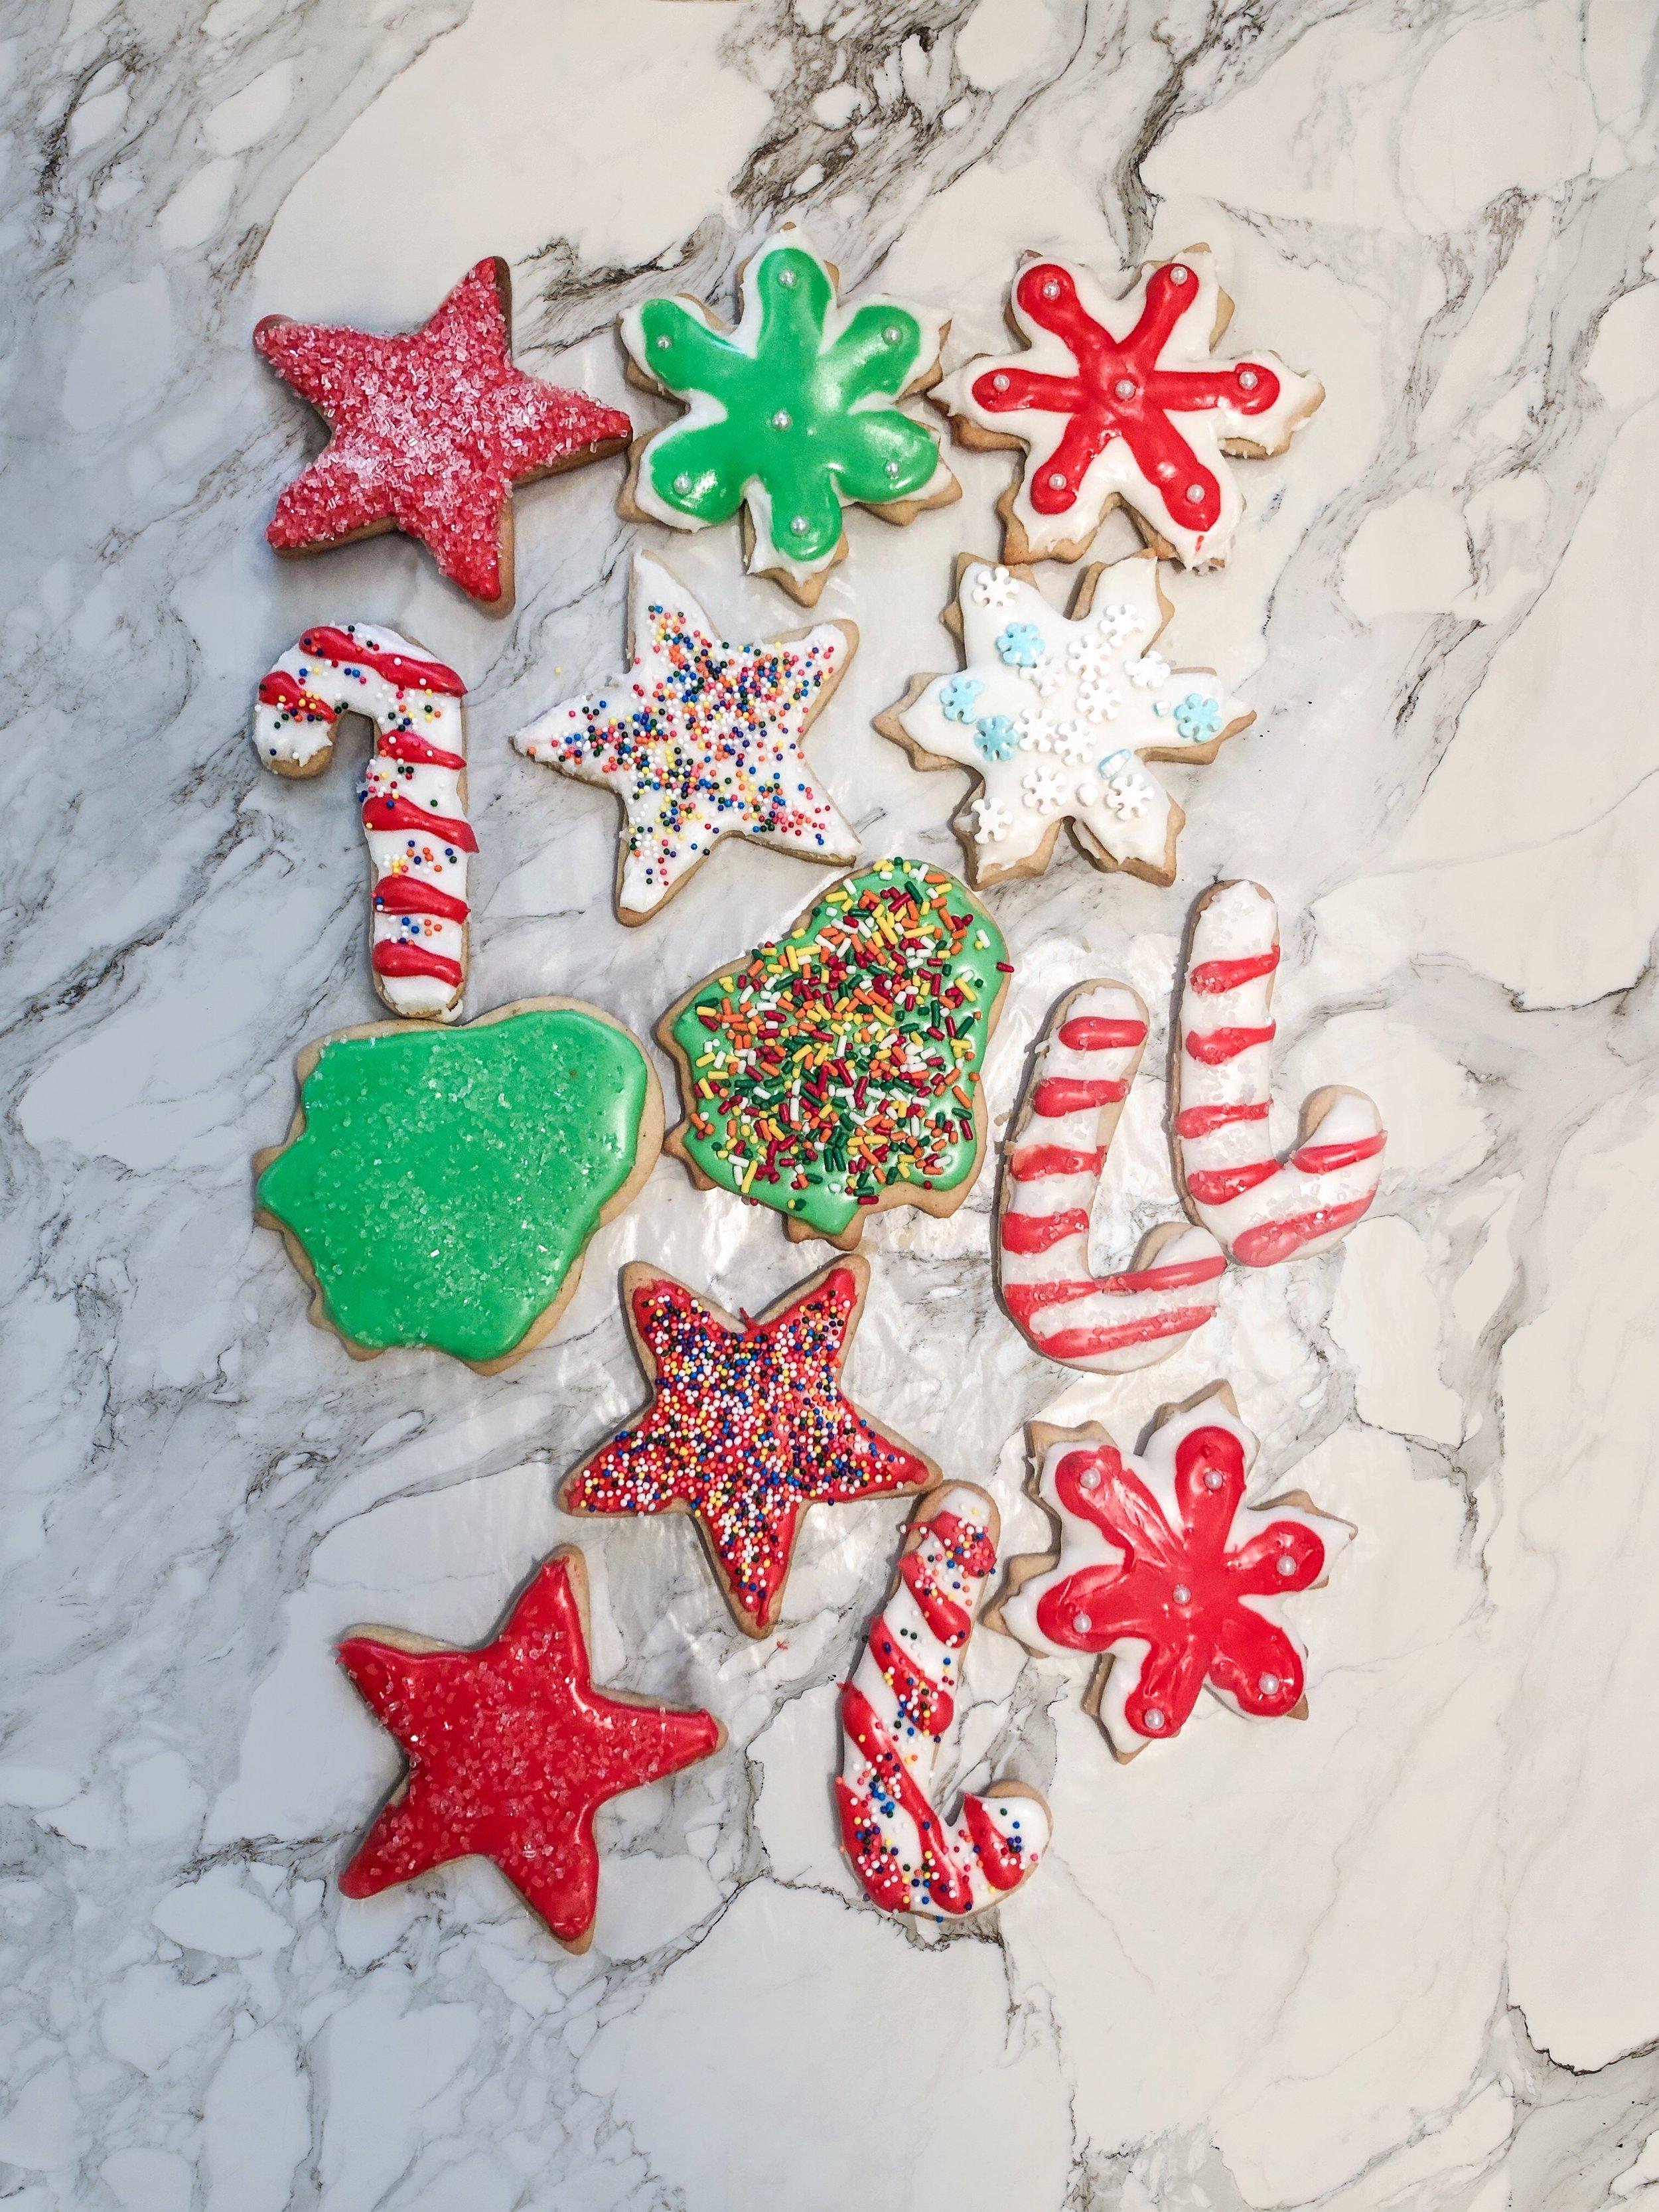 Perfect Cut Out Sugar Cookies - Recipe Below!